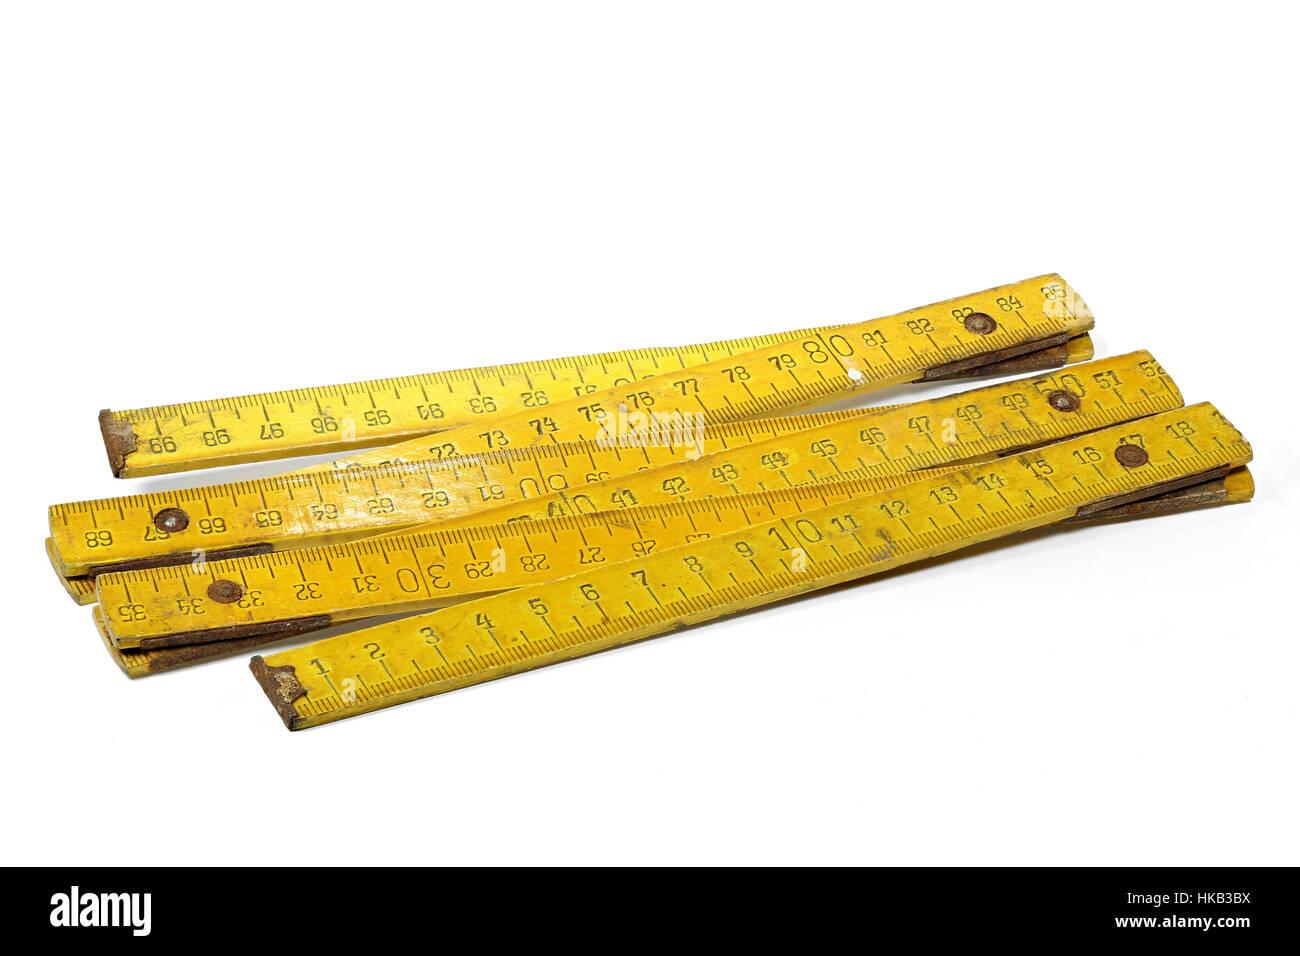 vintage 1 meter yardstick isolated on white background - Stock Image